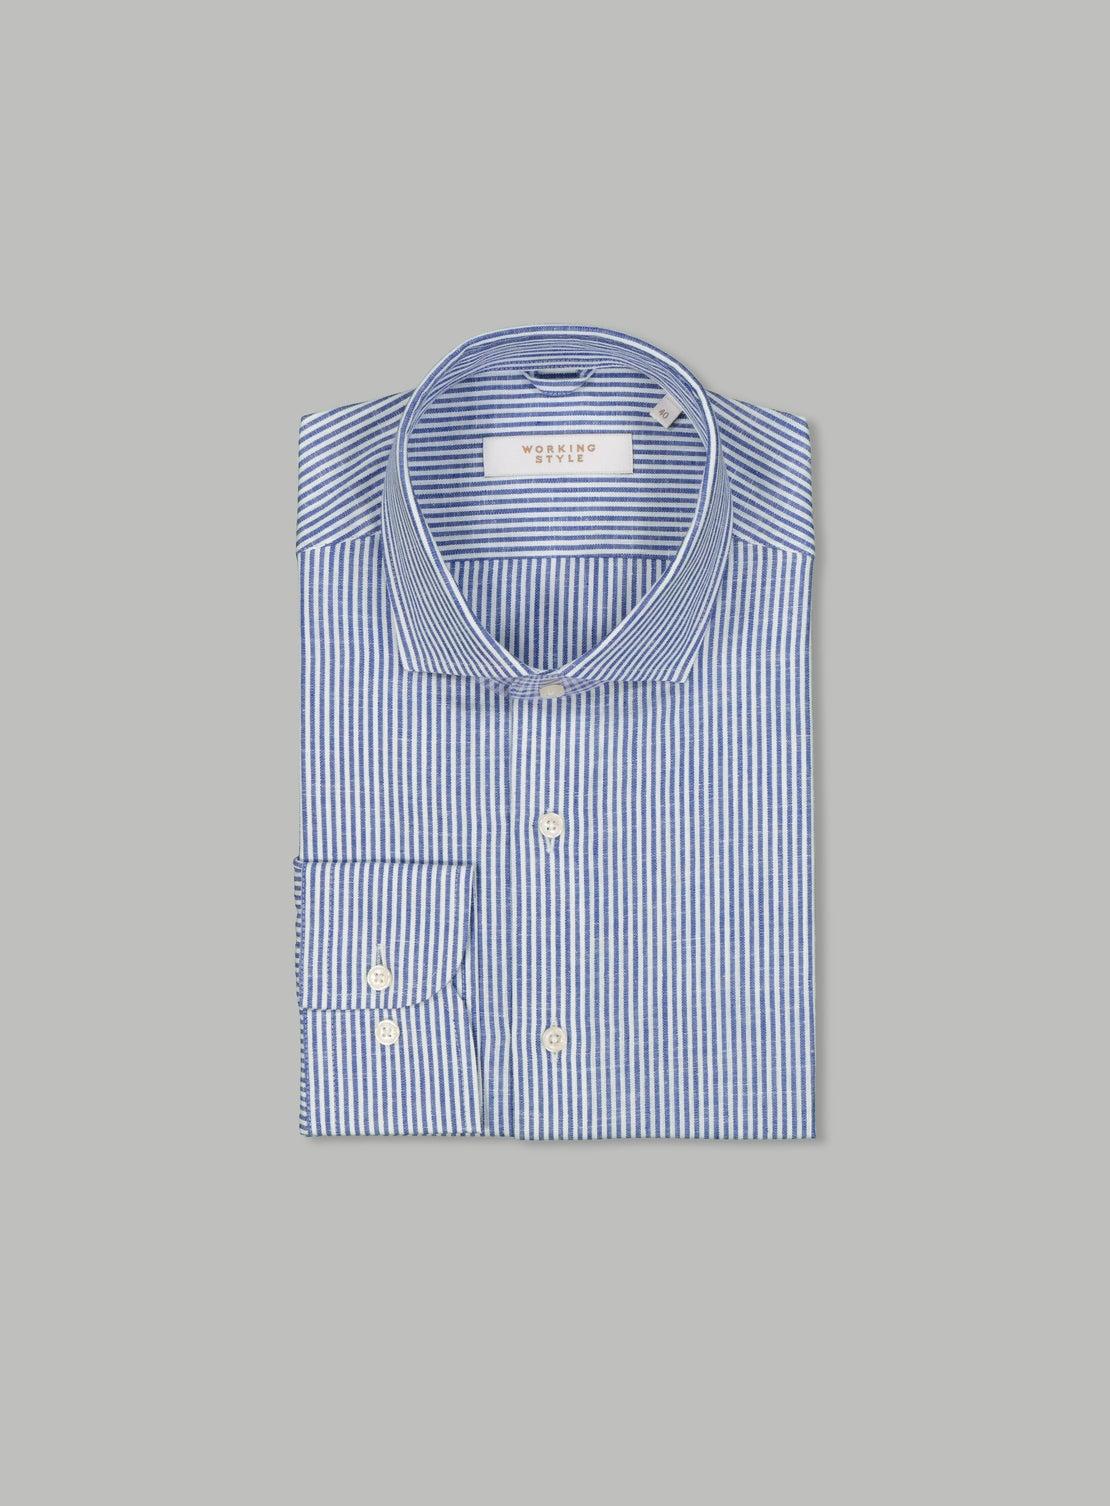 William Blue Shirt